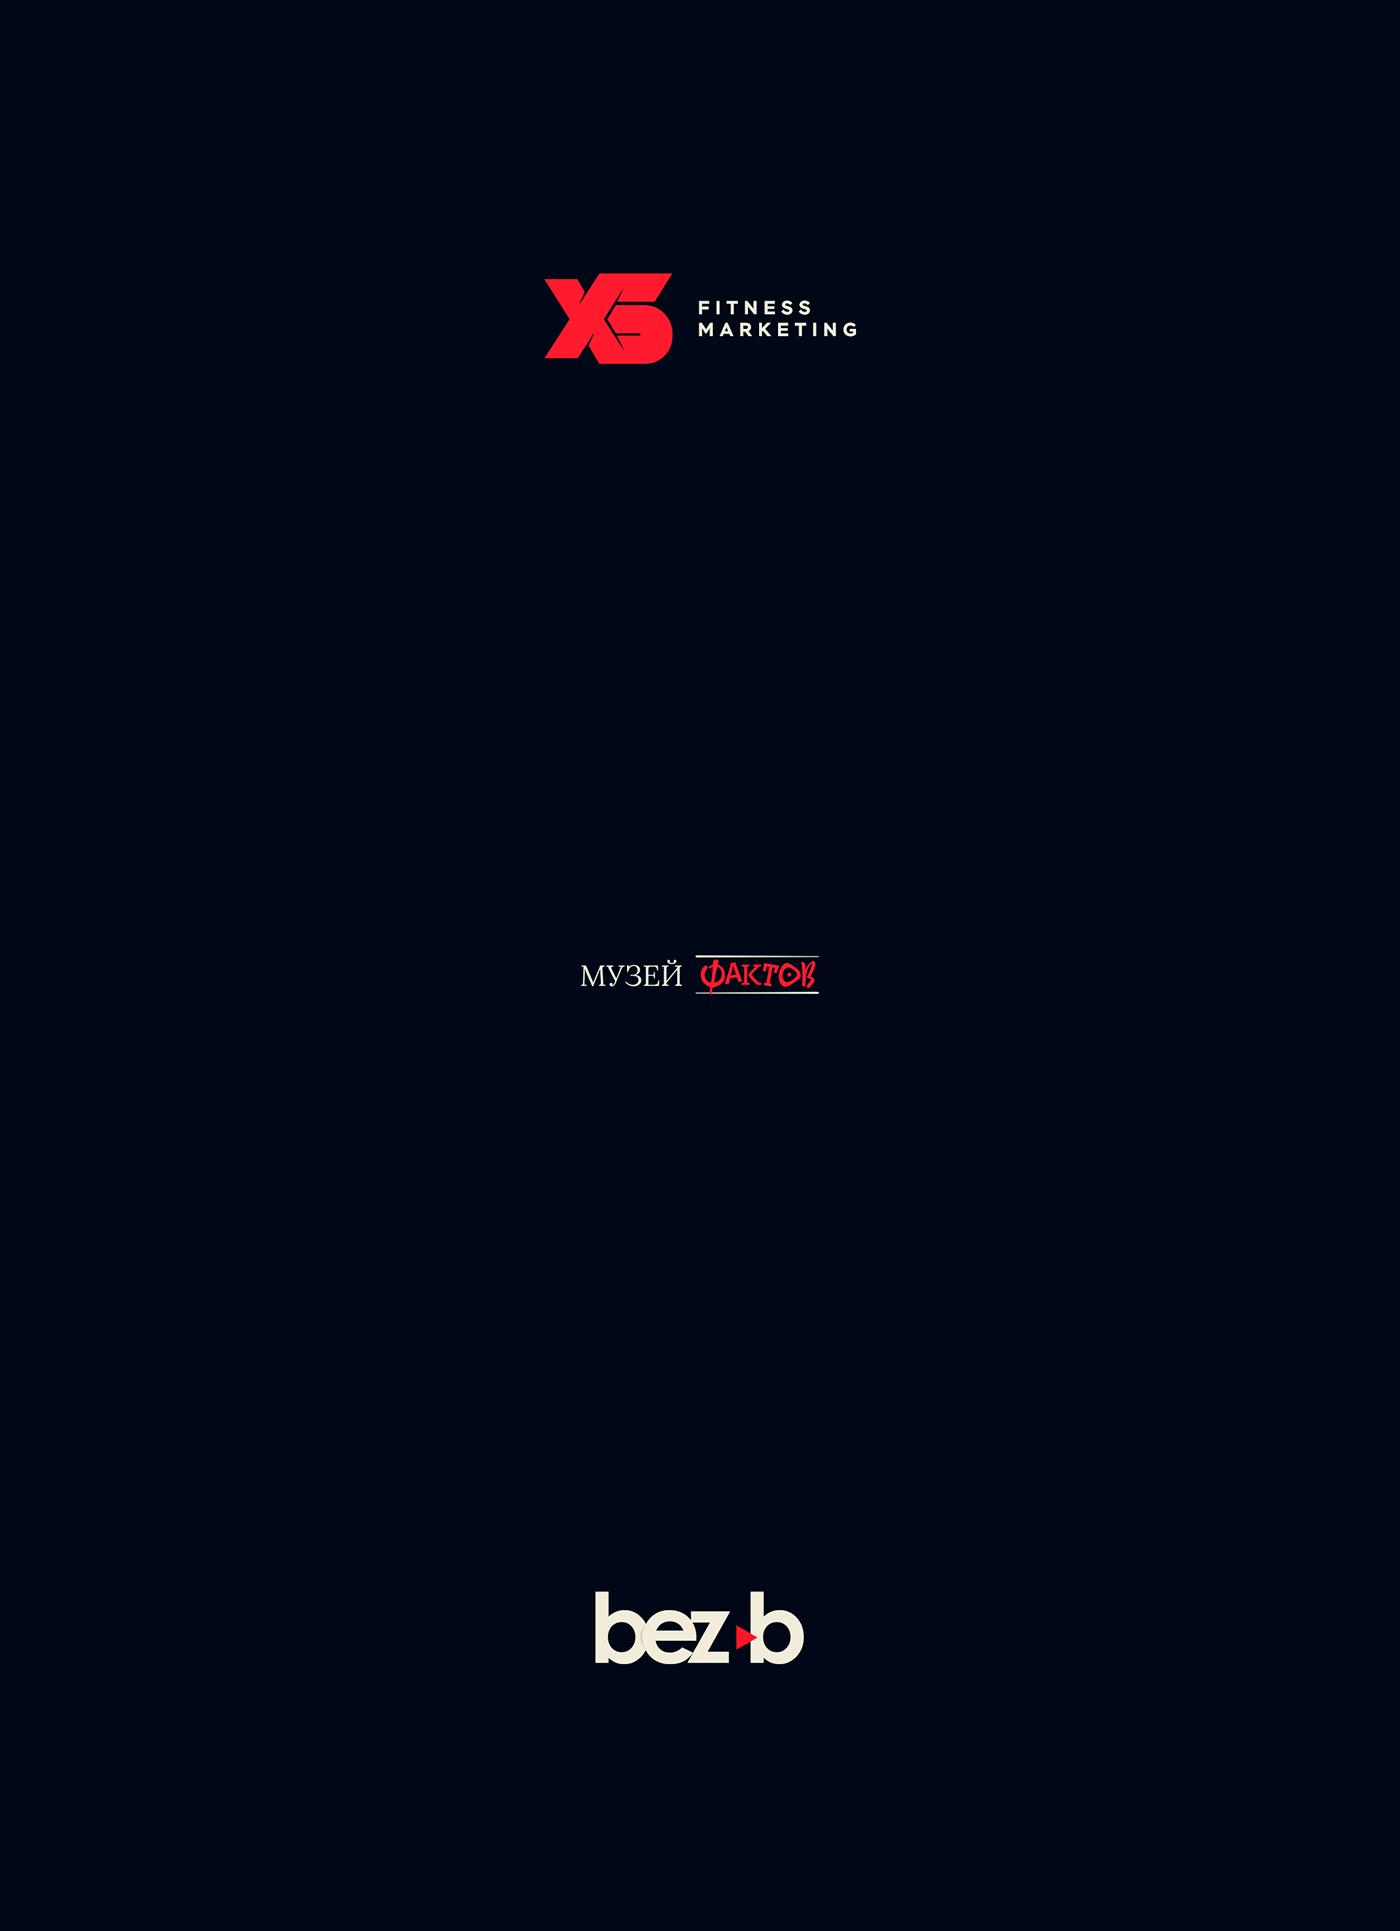 logo logofolio Logotype logotypes perfection brand branding  art Picture design